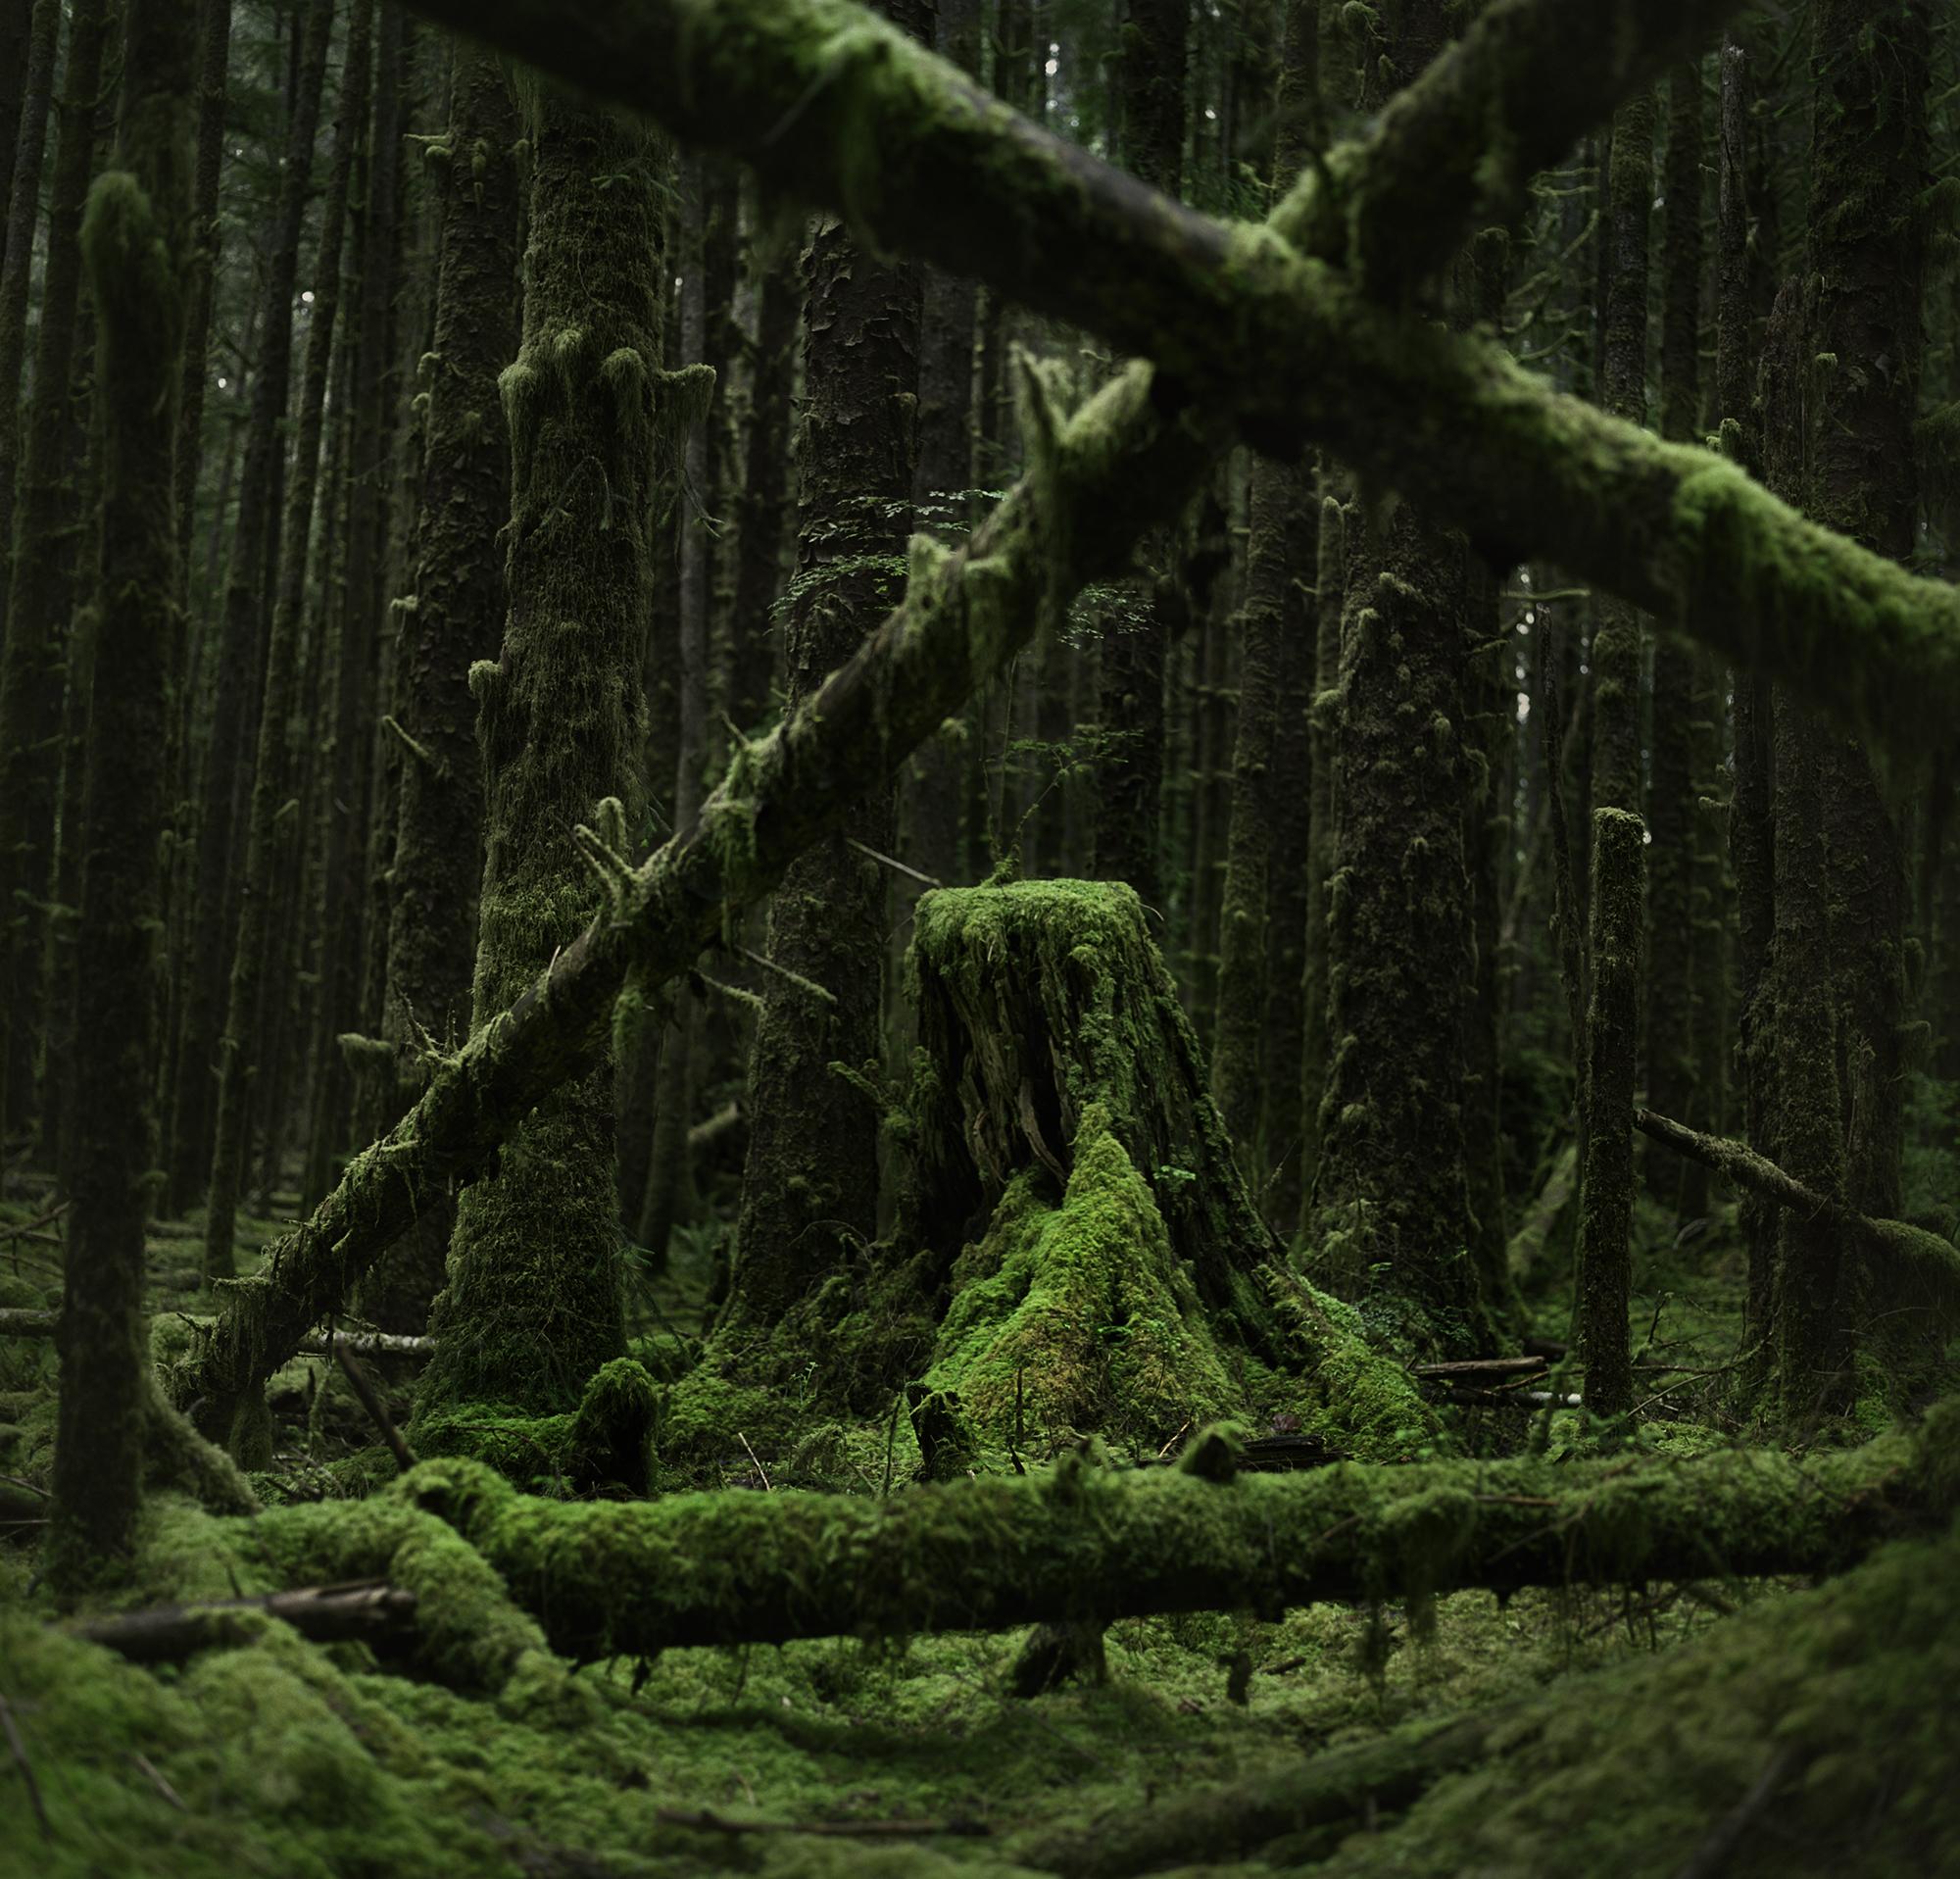 hoh stump crossed logsv2.jpg